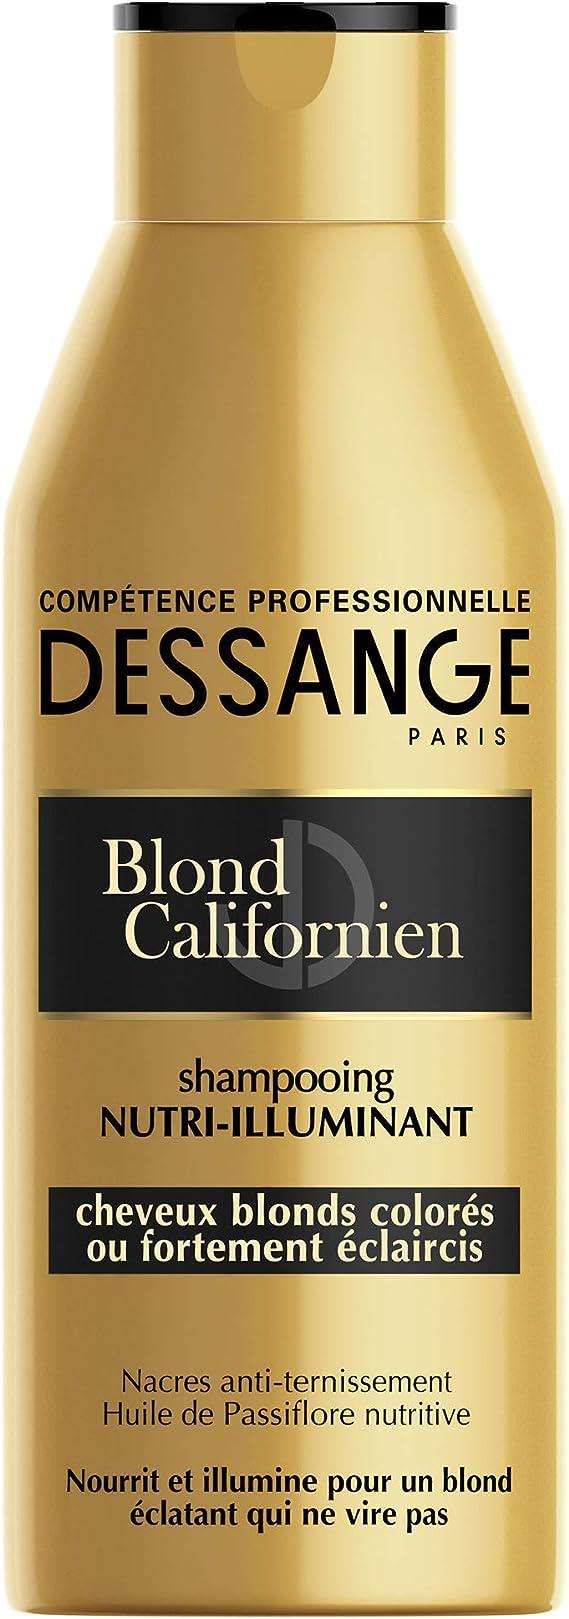 Dessange - Blond Californien Champu nutri-iluminante para cabellos rubios, tenidos o muy aclarados, 250 ml